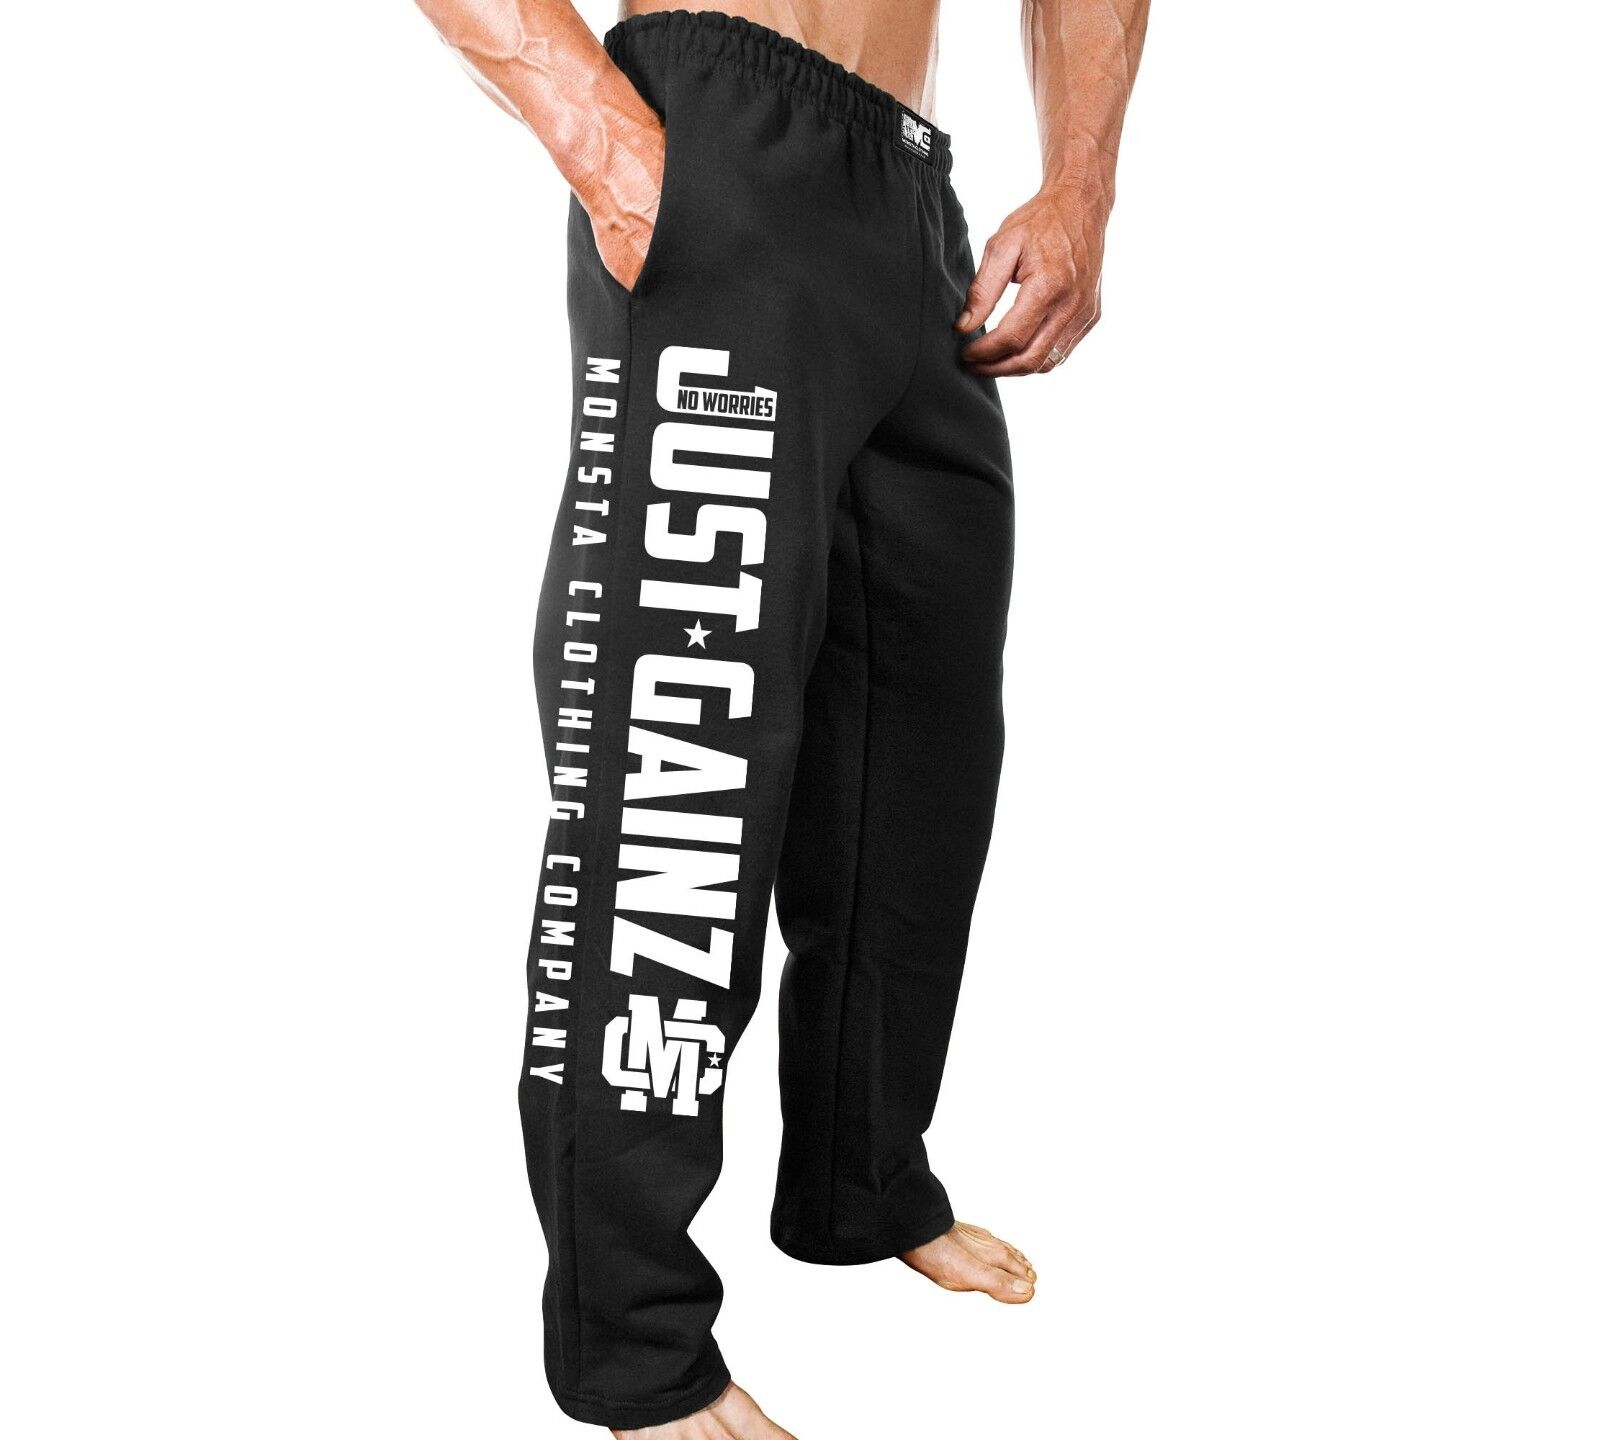 New Men's Monsta Clothing Fitness Gym Sweatpants - Just Gain